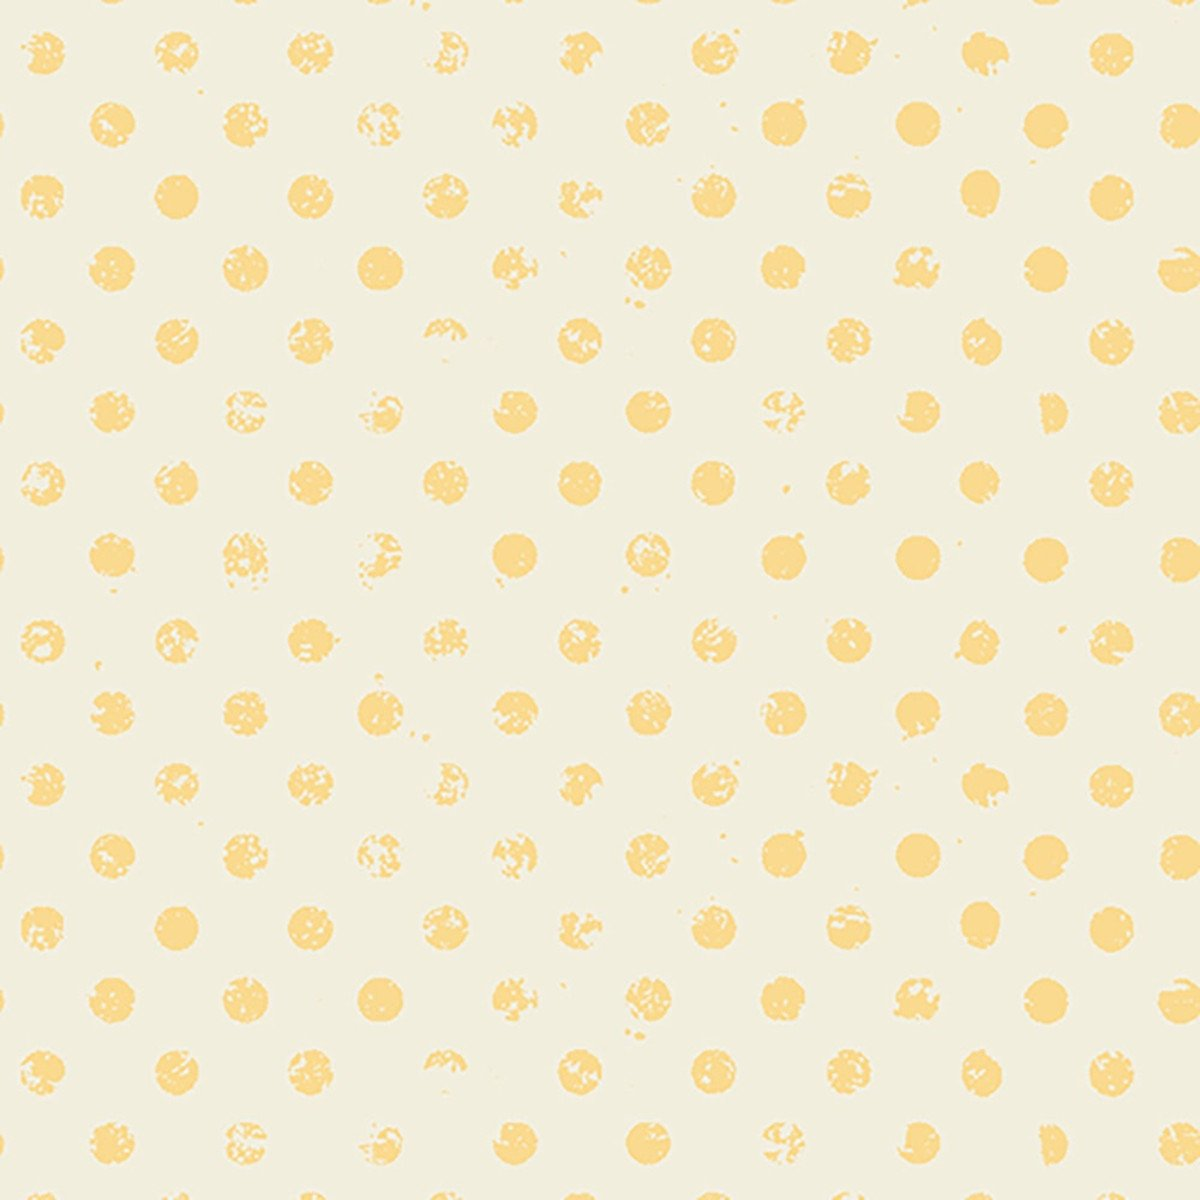 Yellow - Dot - Lemonade by Dan DiPaolo - Y3214-9